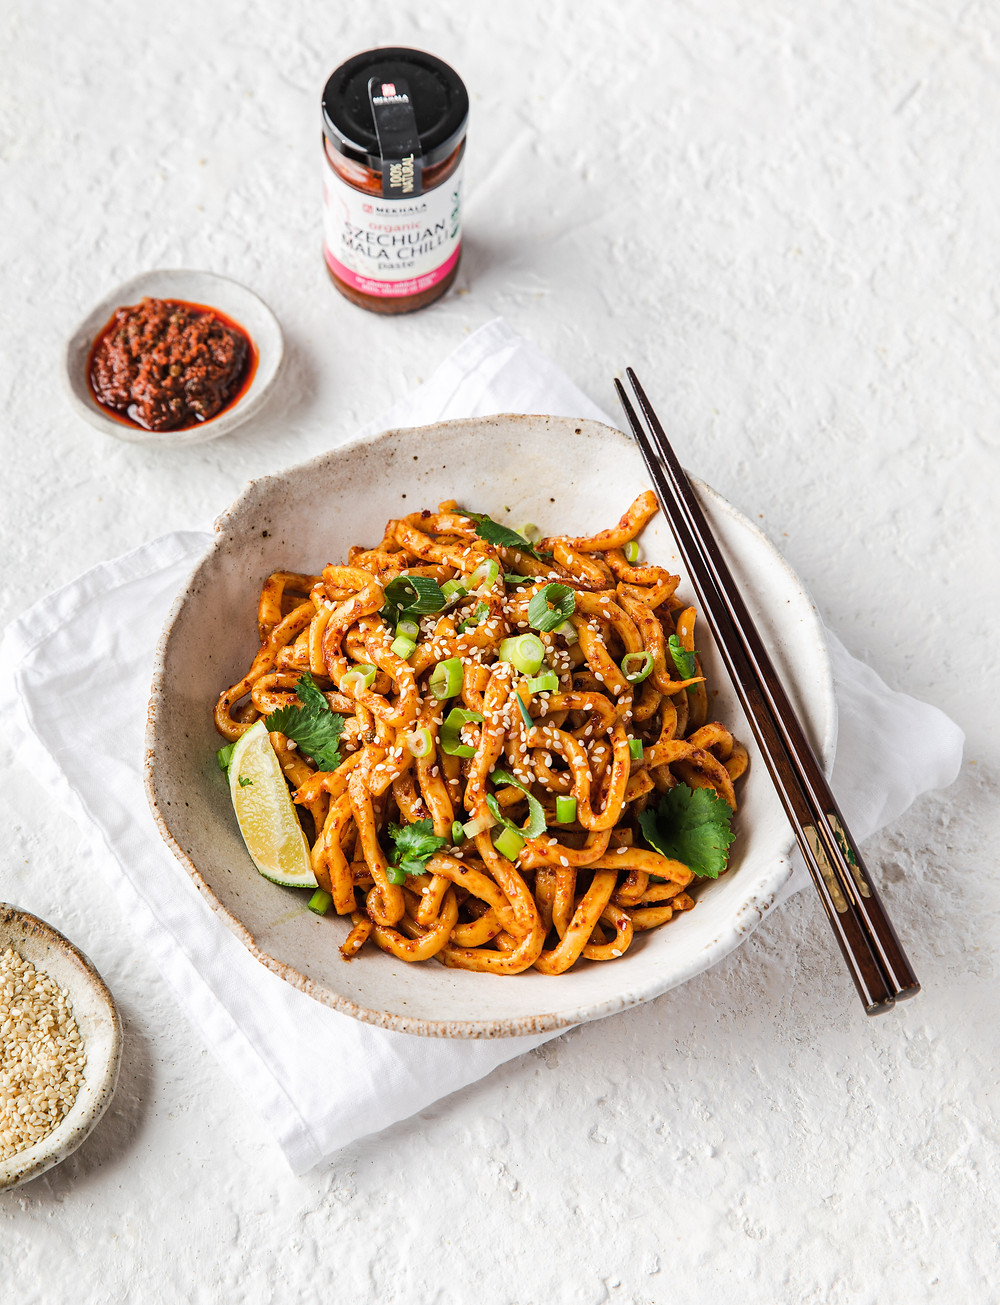 Biang biang Szechuan Udon Stir-fry Noodles